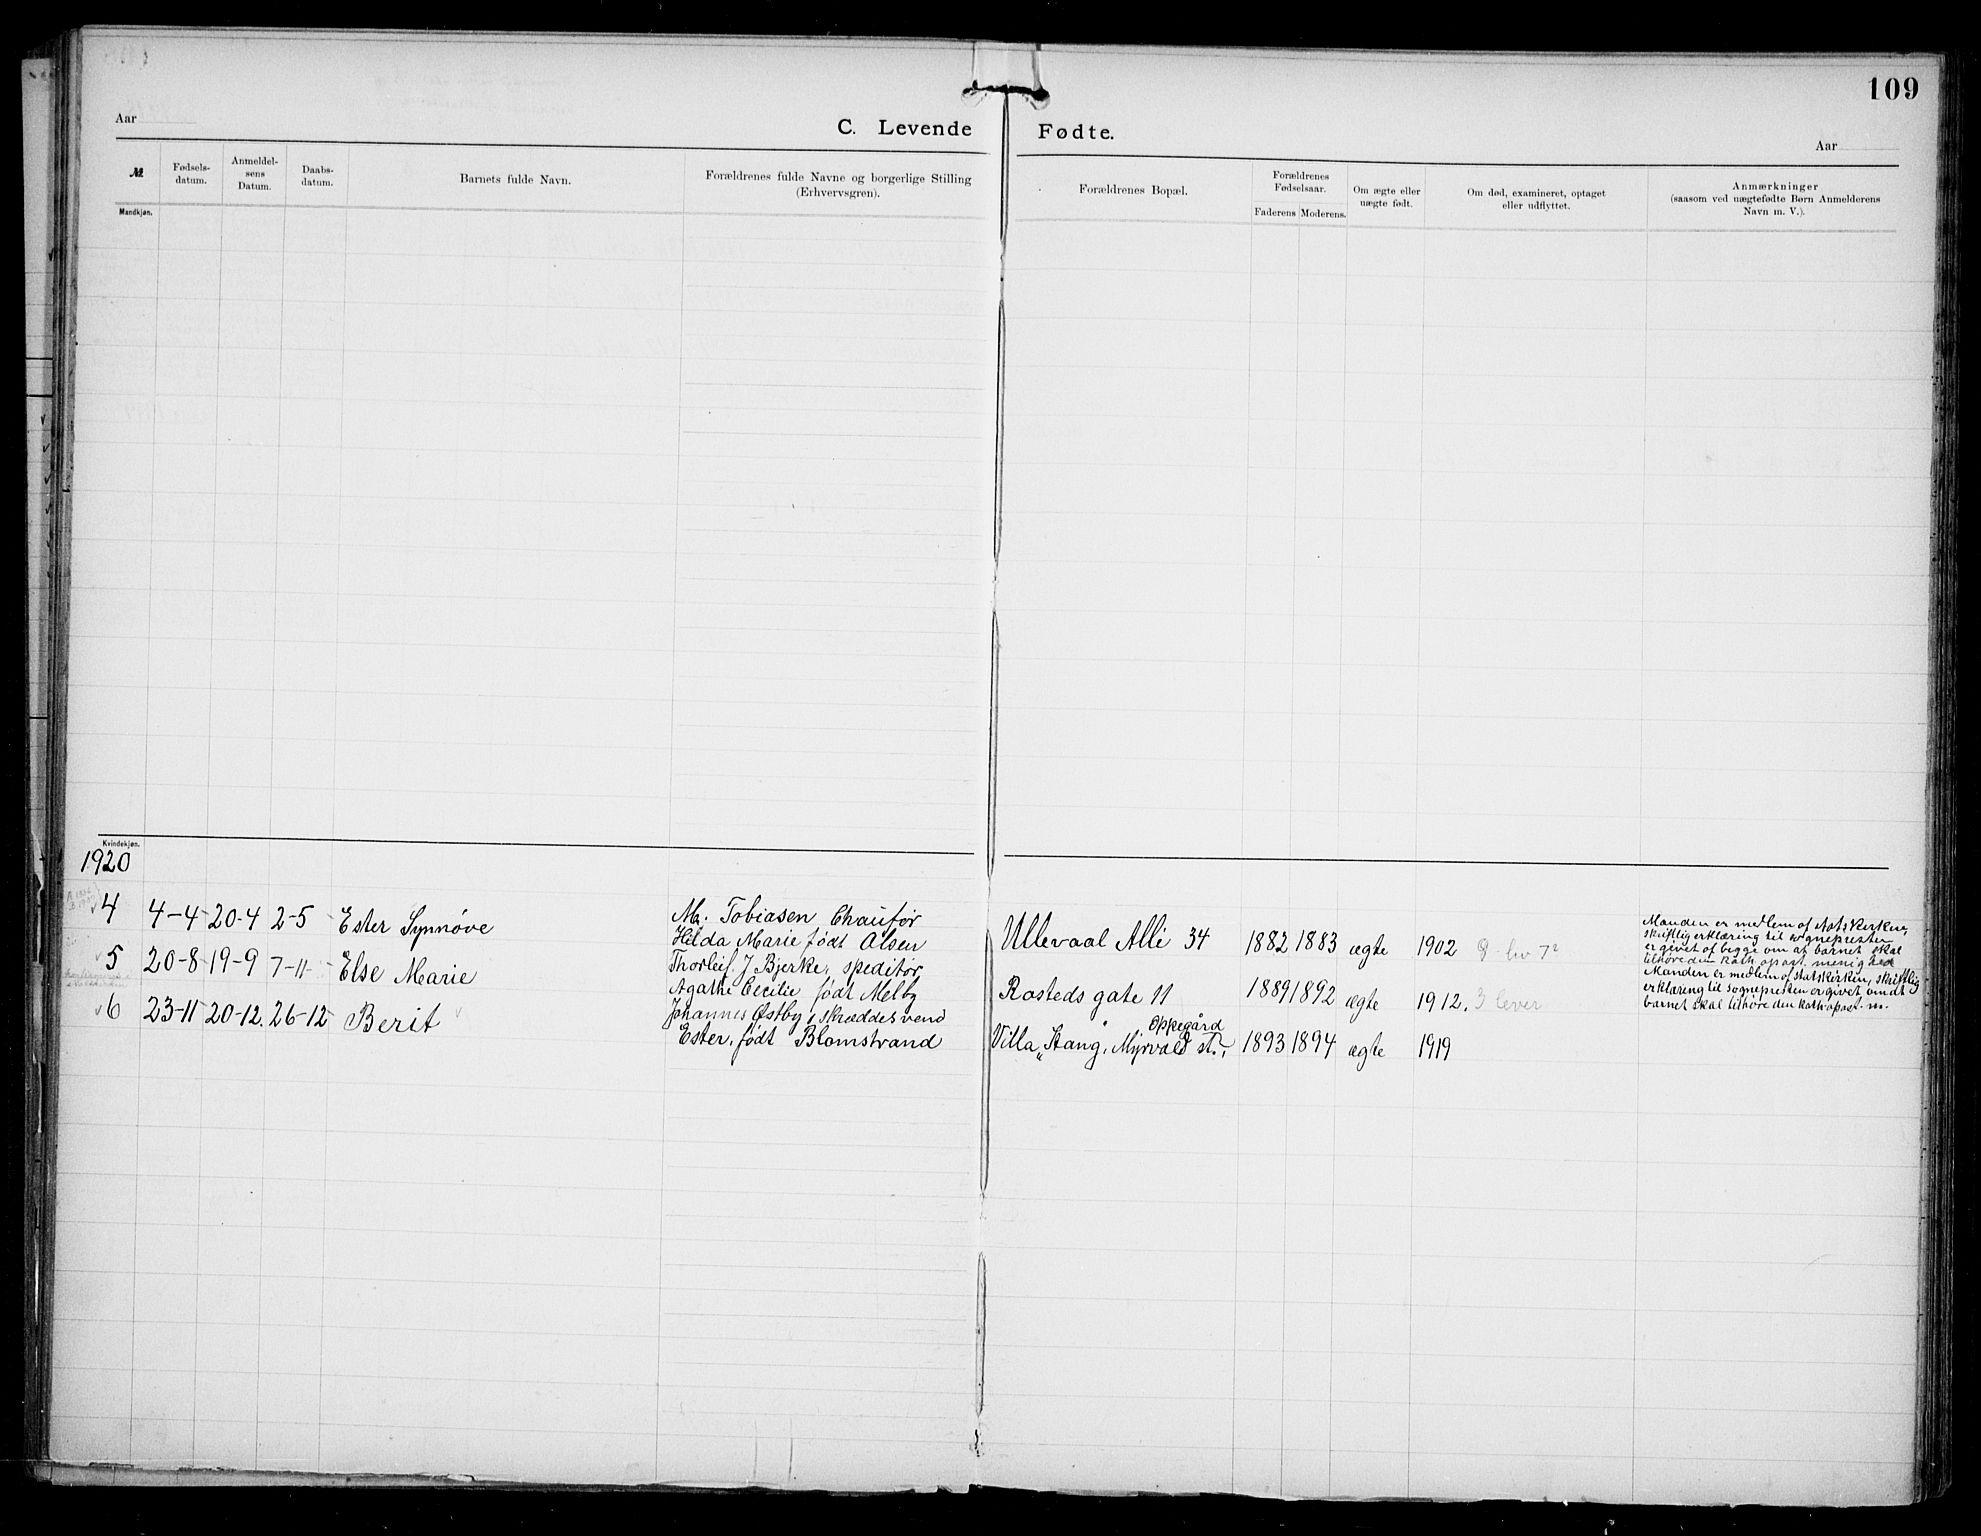 SAO, Den katolsk apostoliske menighet i Oslo , F/Fa/L0002: Dissenterprotokoll nr. 2, 1892-1937, s. 109